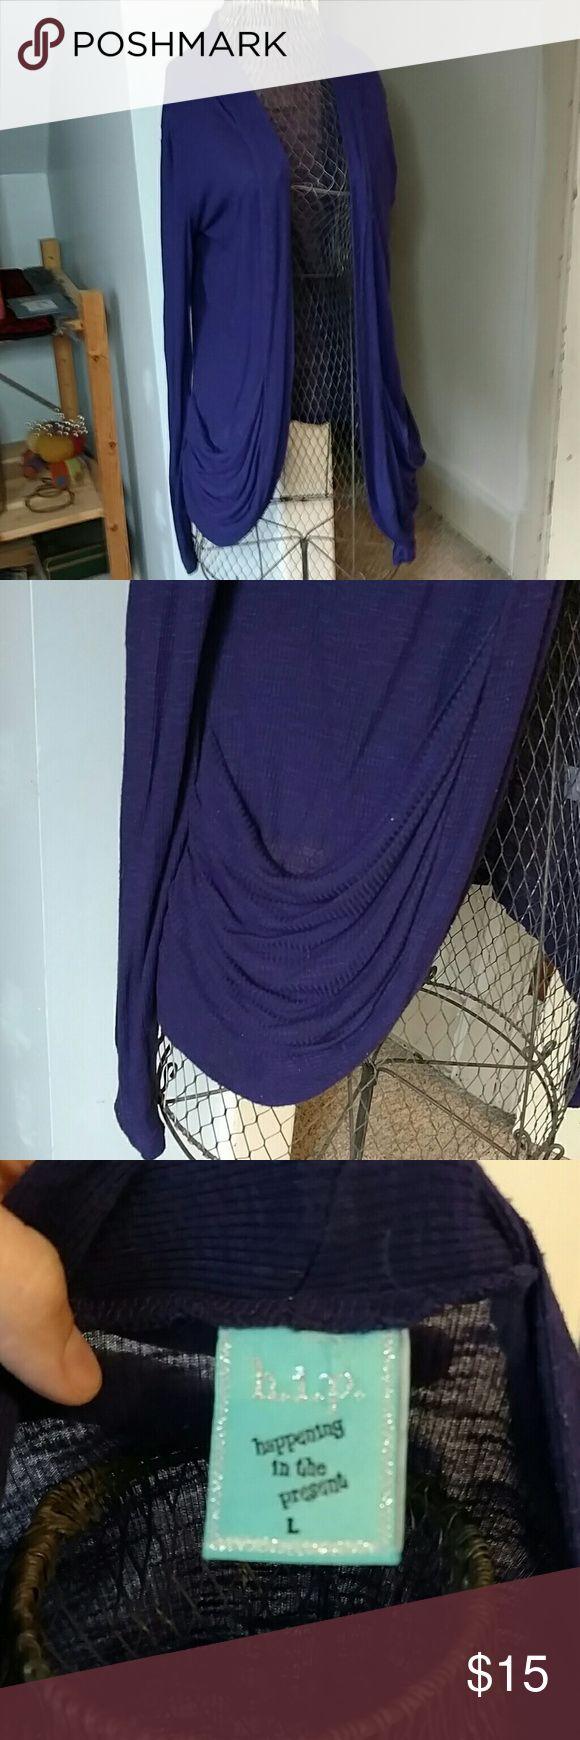 10 best My Posh Closet images on Pinterest | Sweater cardigan ...